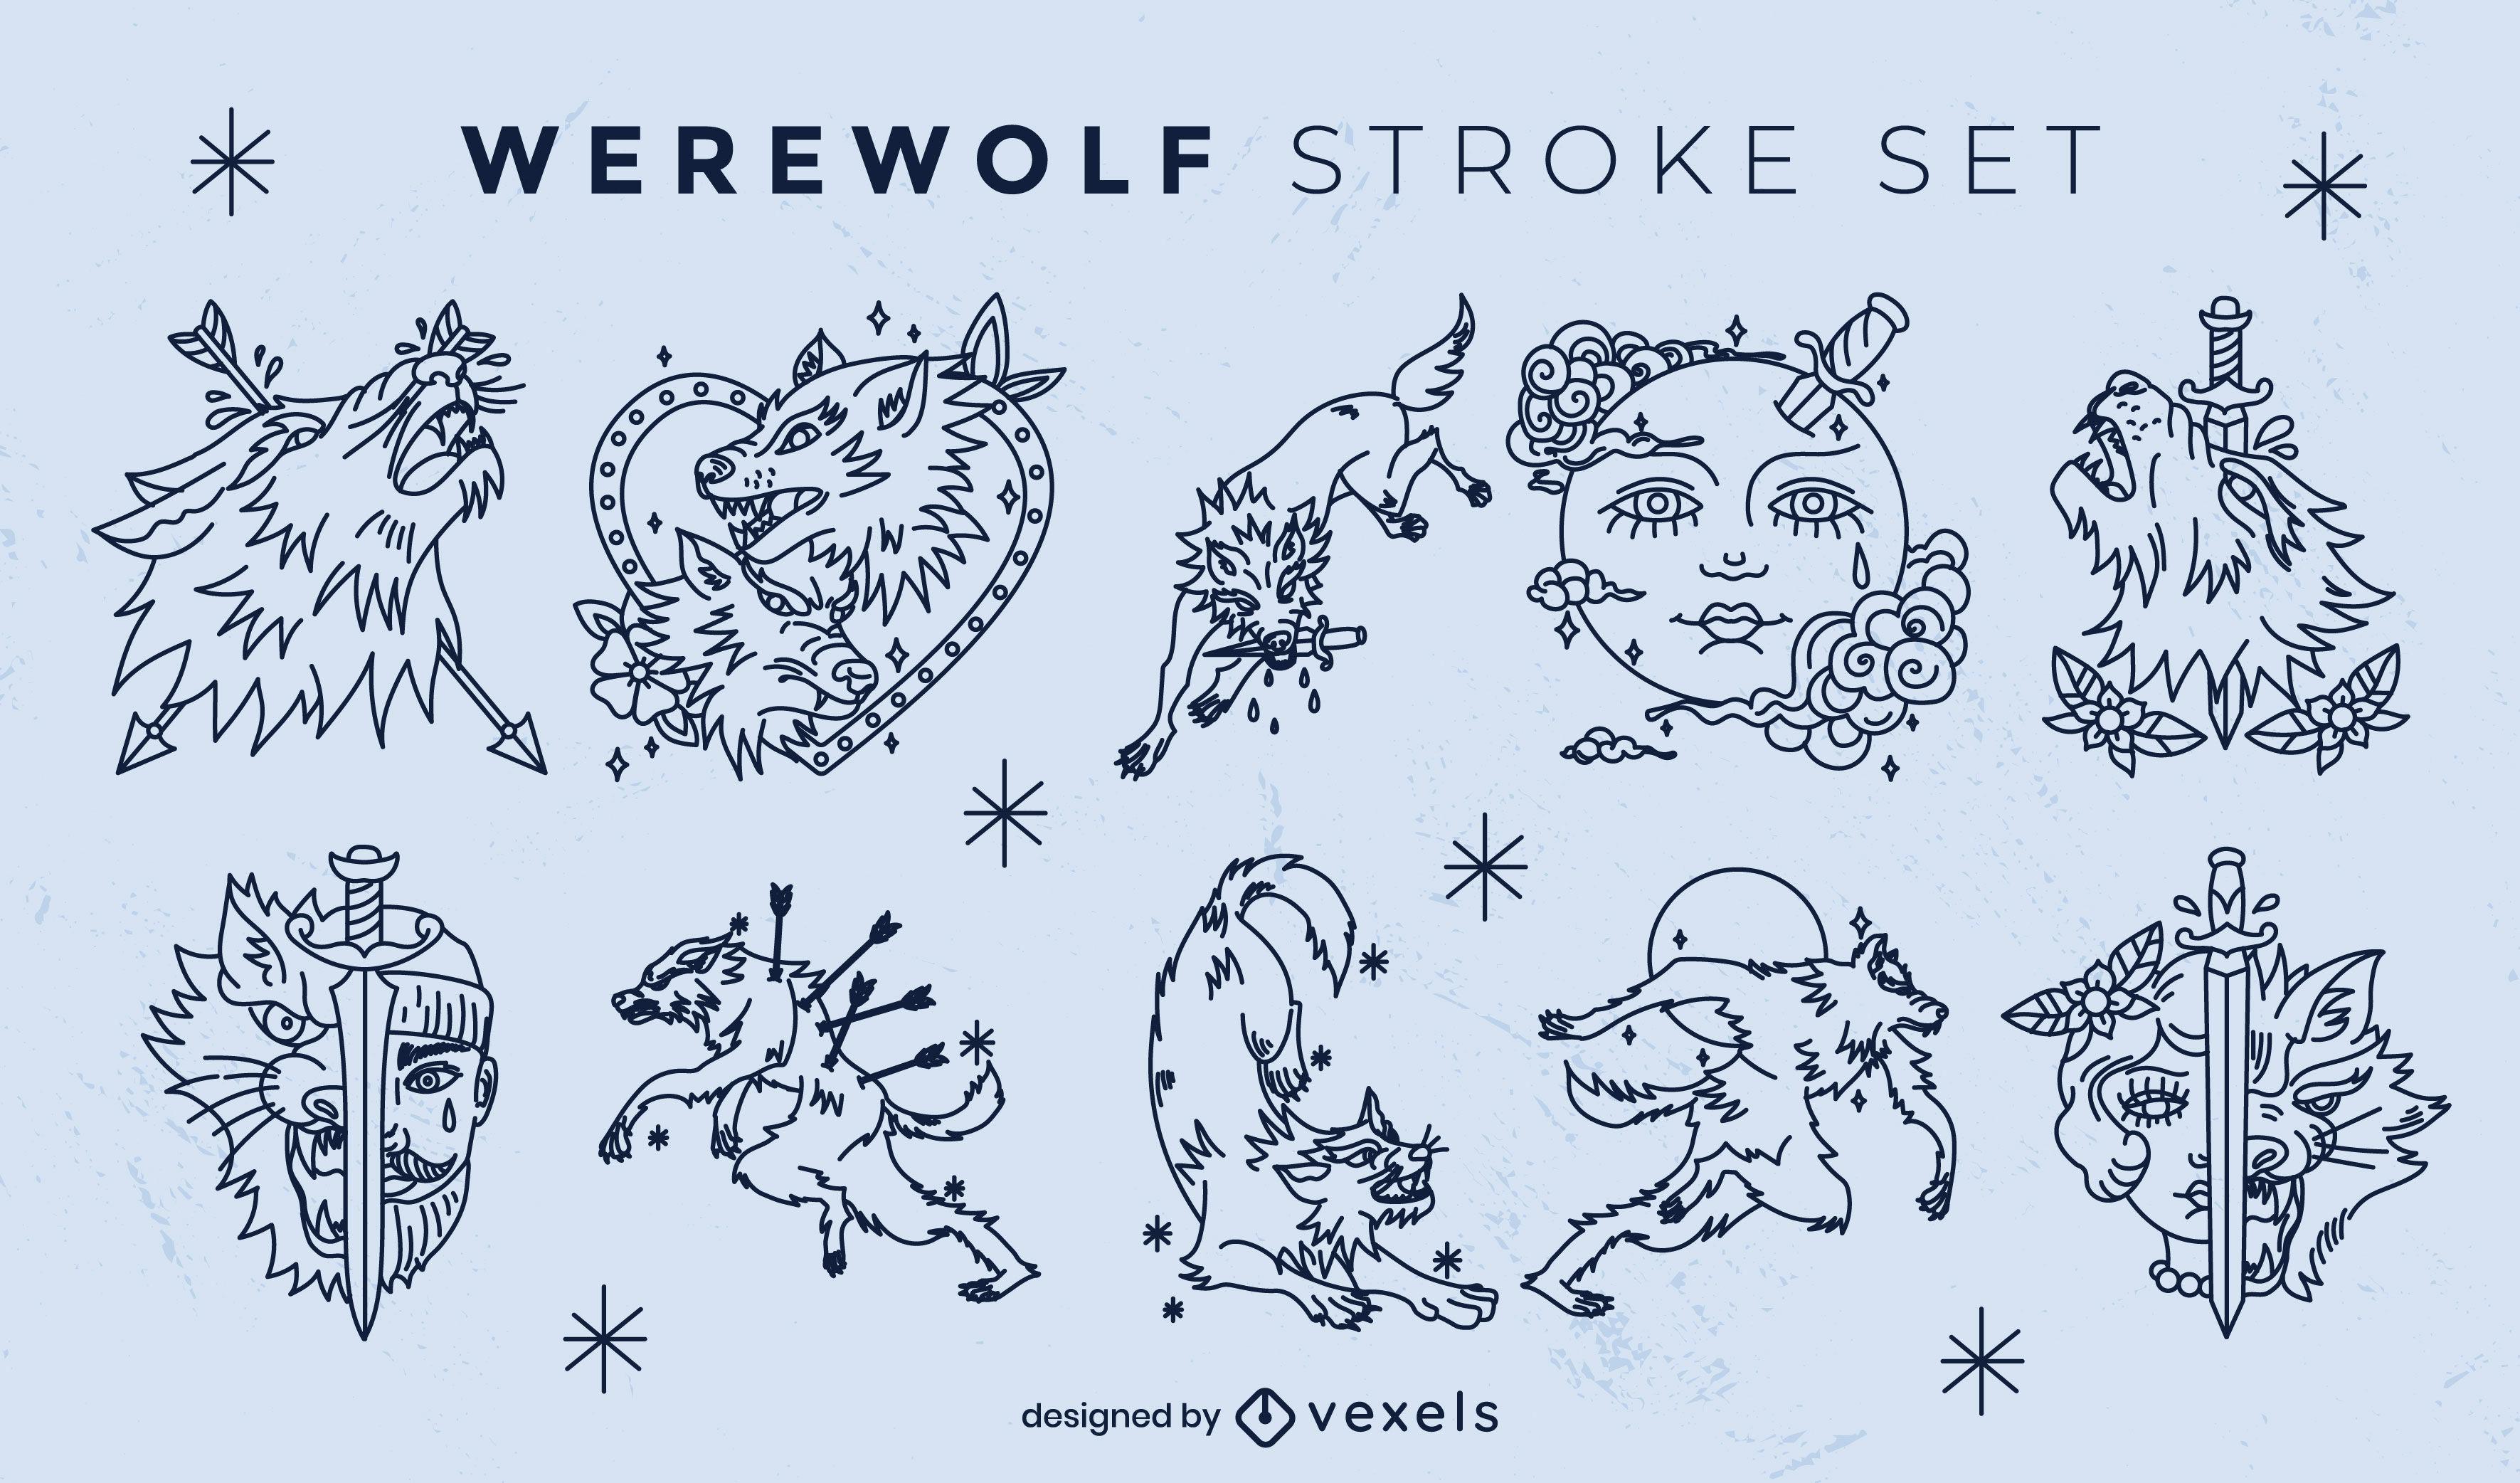 Werewolf creature character stroke set